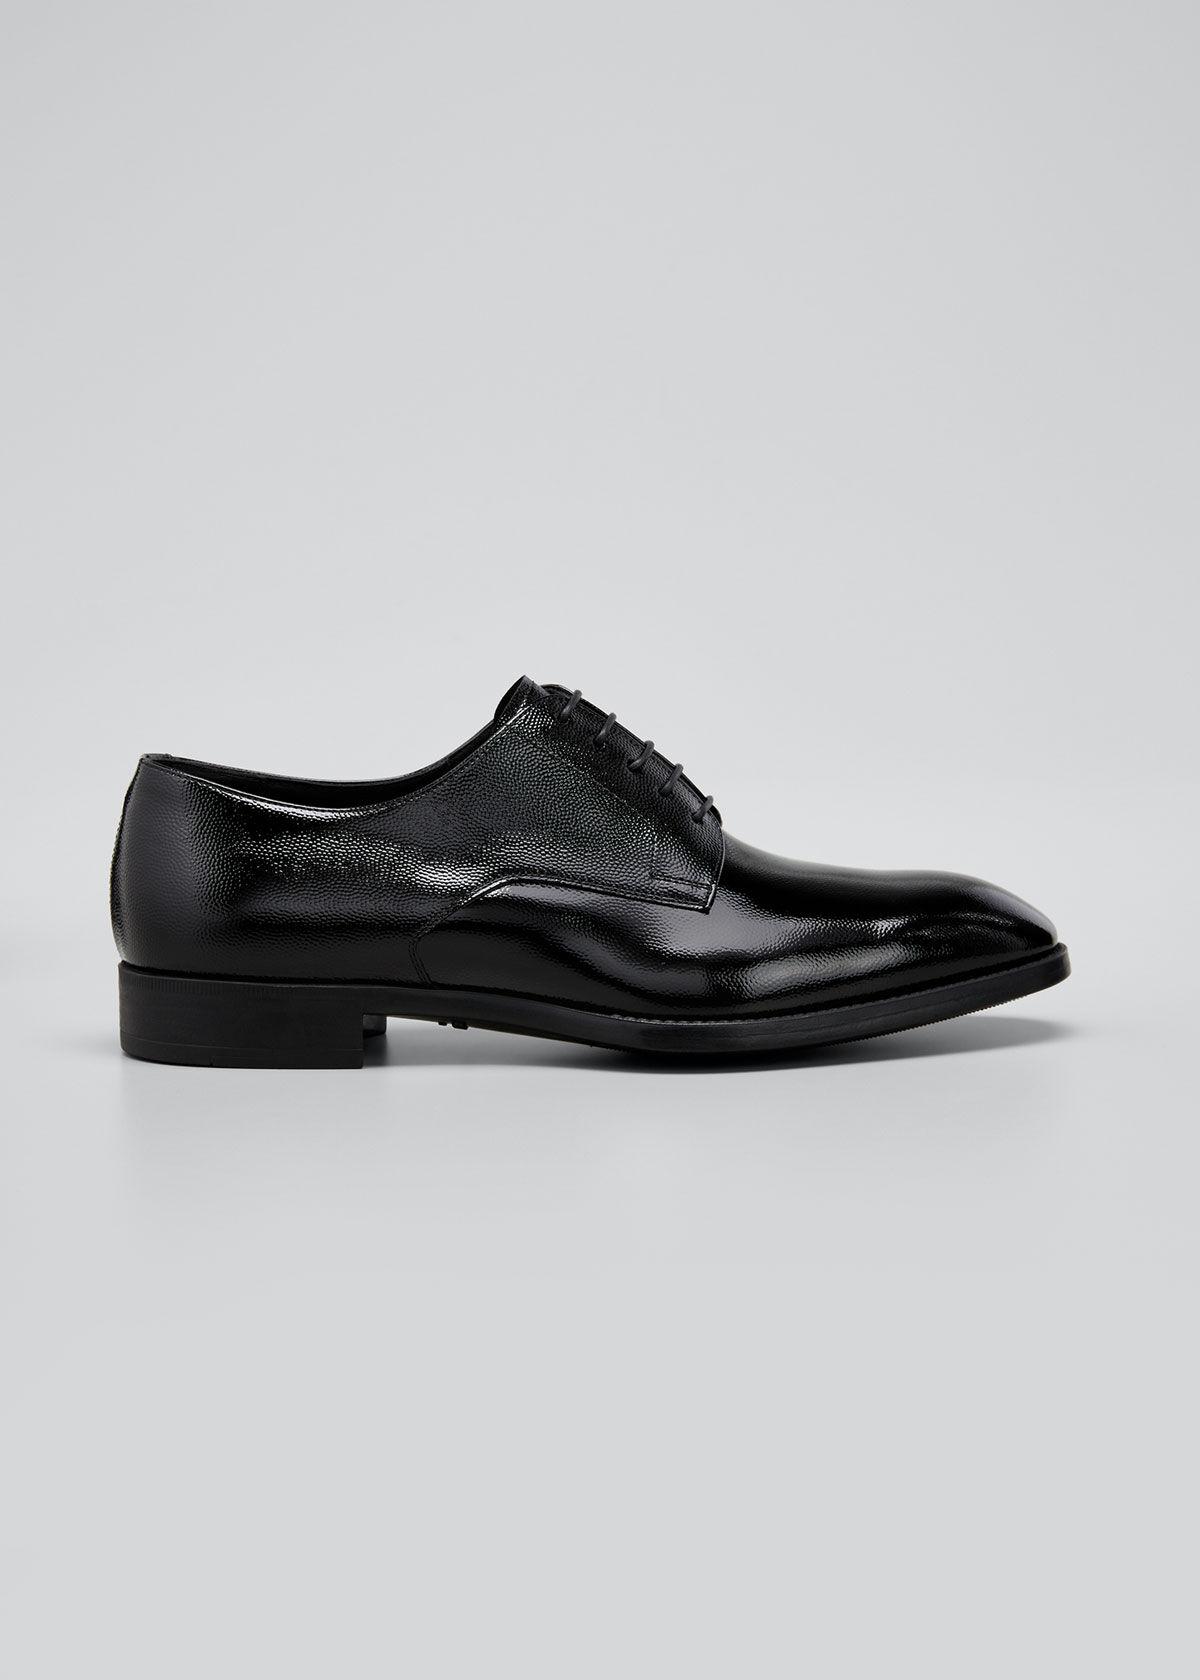 Giorgio Armani Men's Pebbled Leather Lace-Up Shoes  - male - BLACK - Size: 8 UK (9D US)